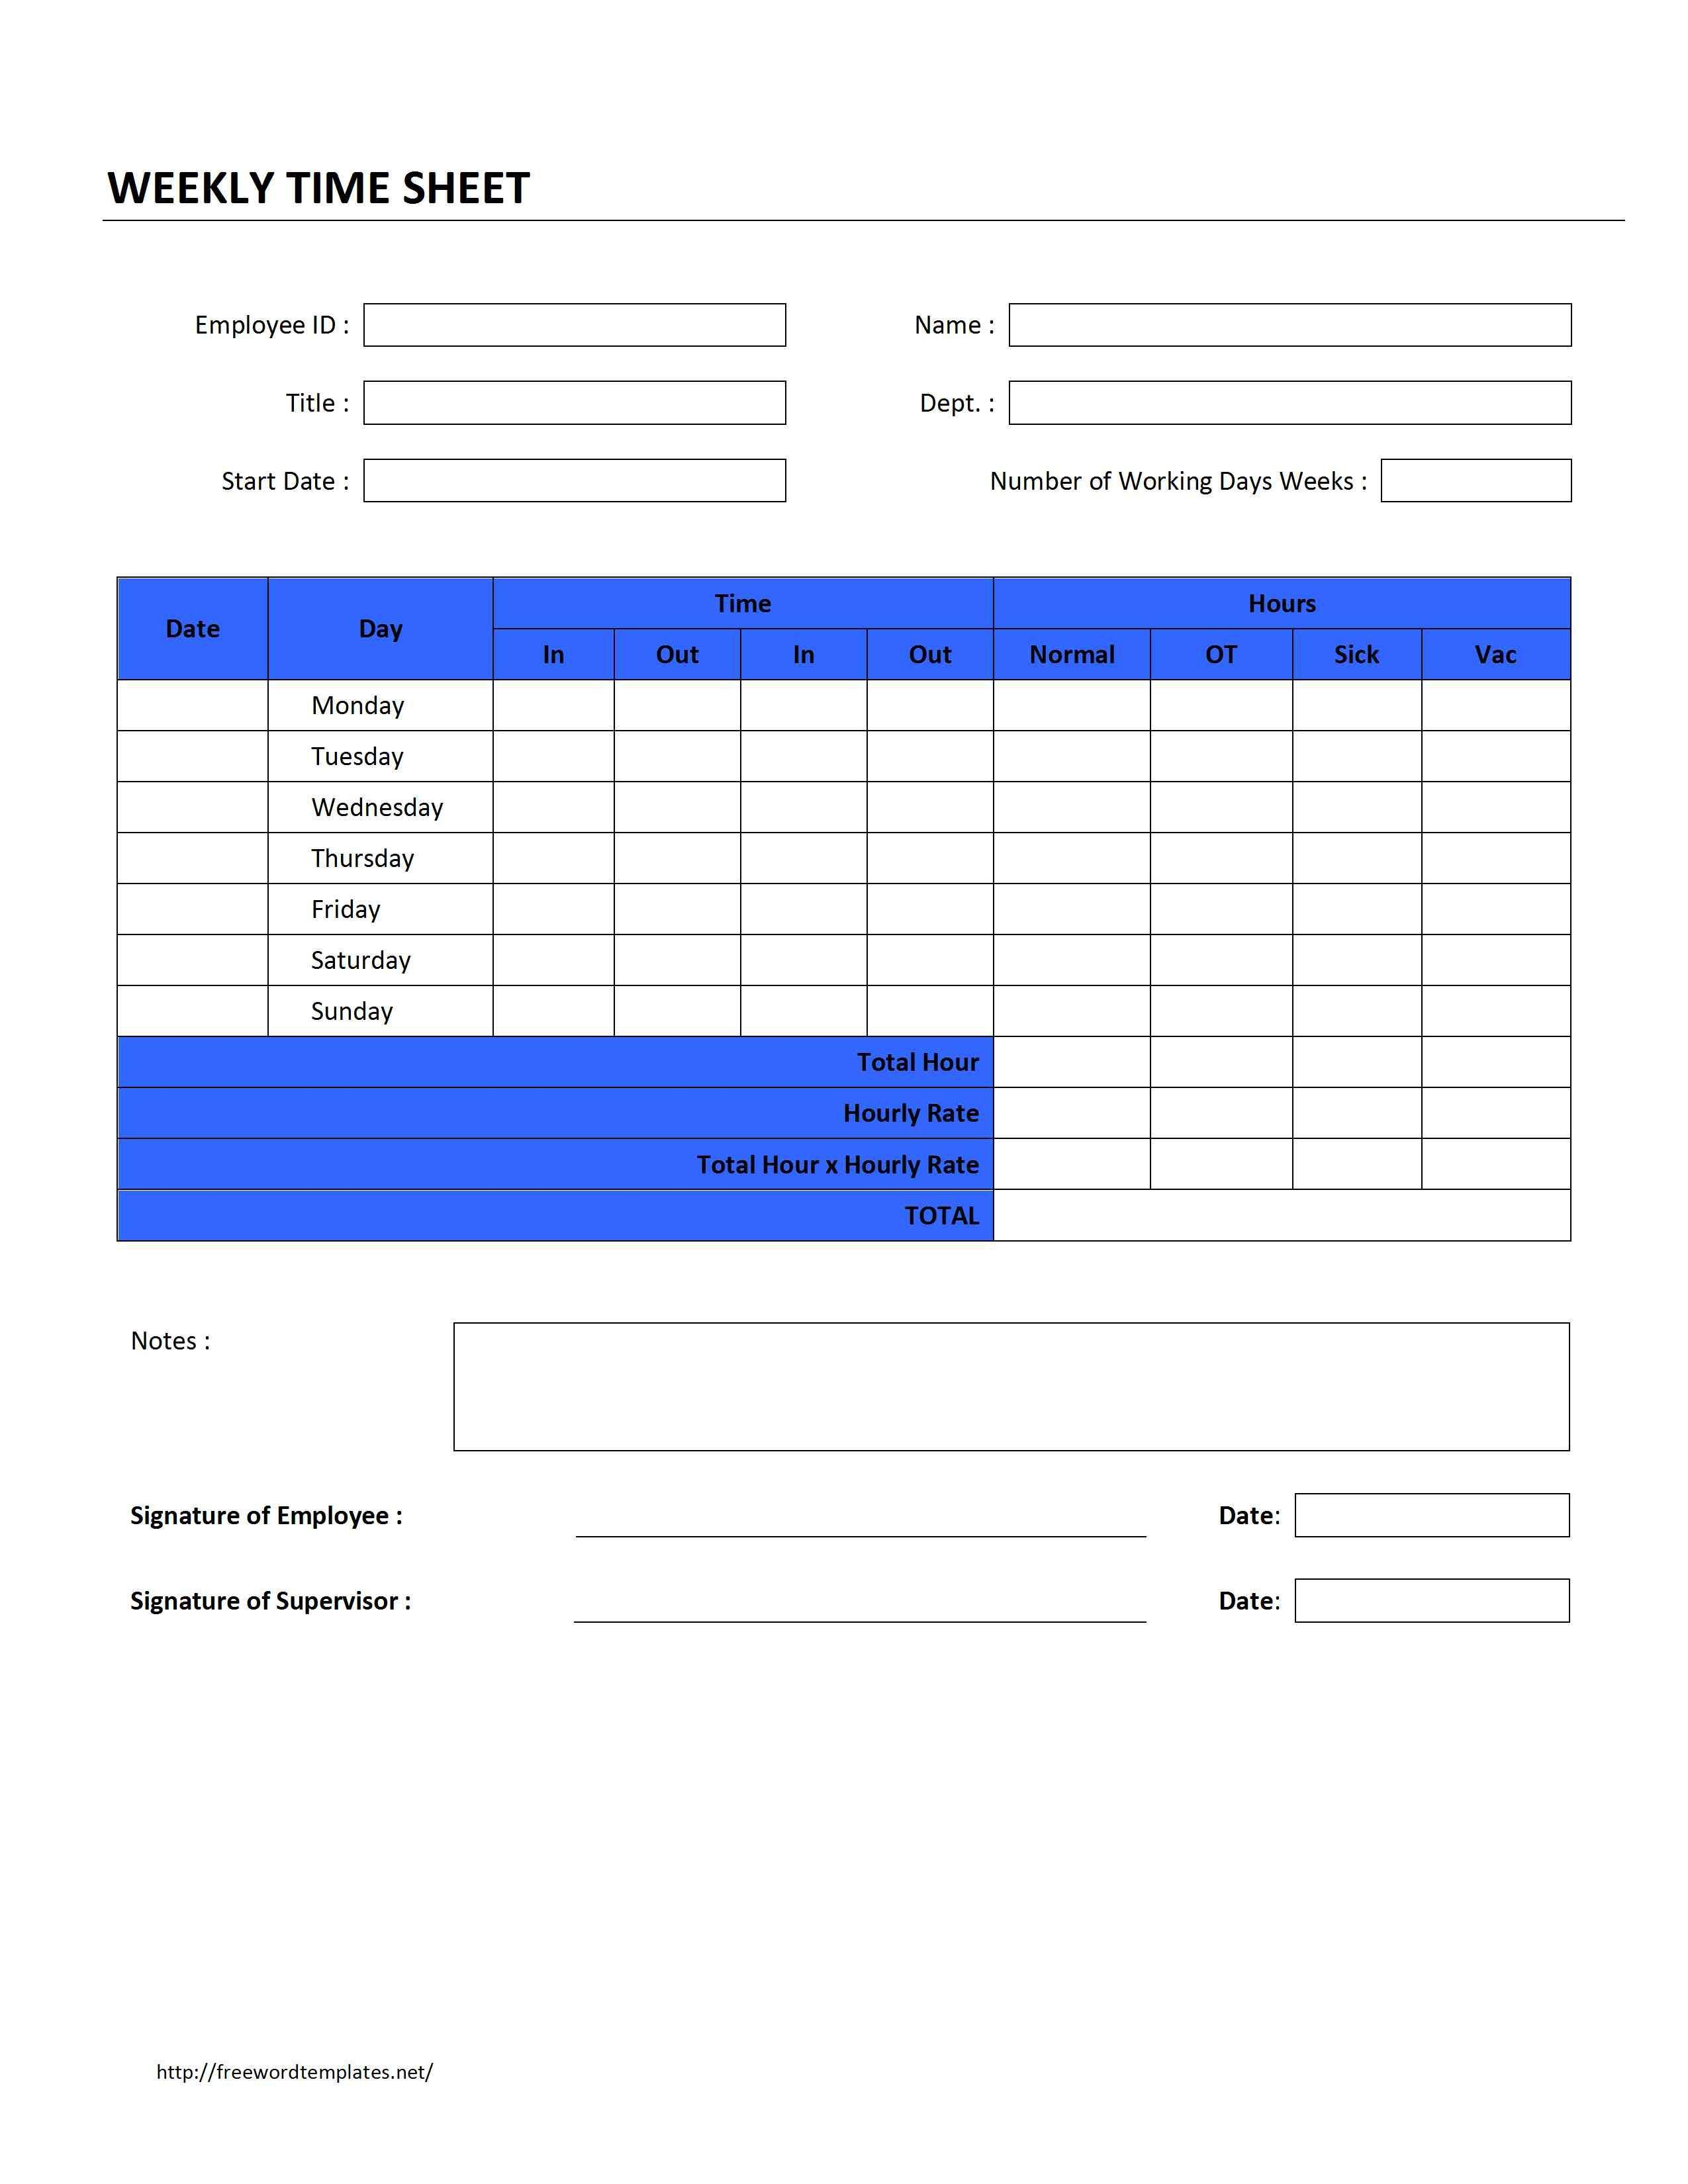 Timesheet Invoice Templates